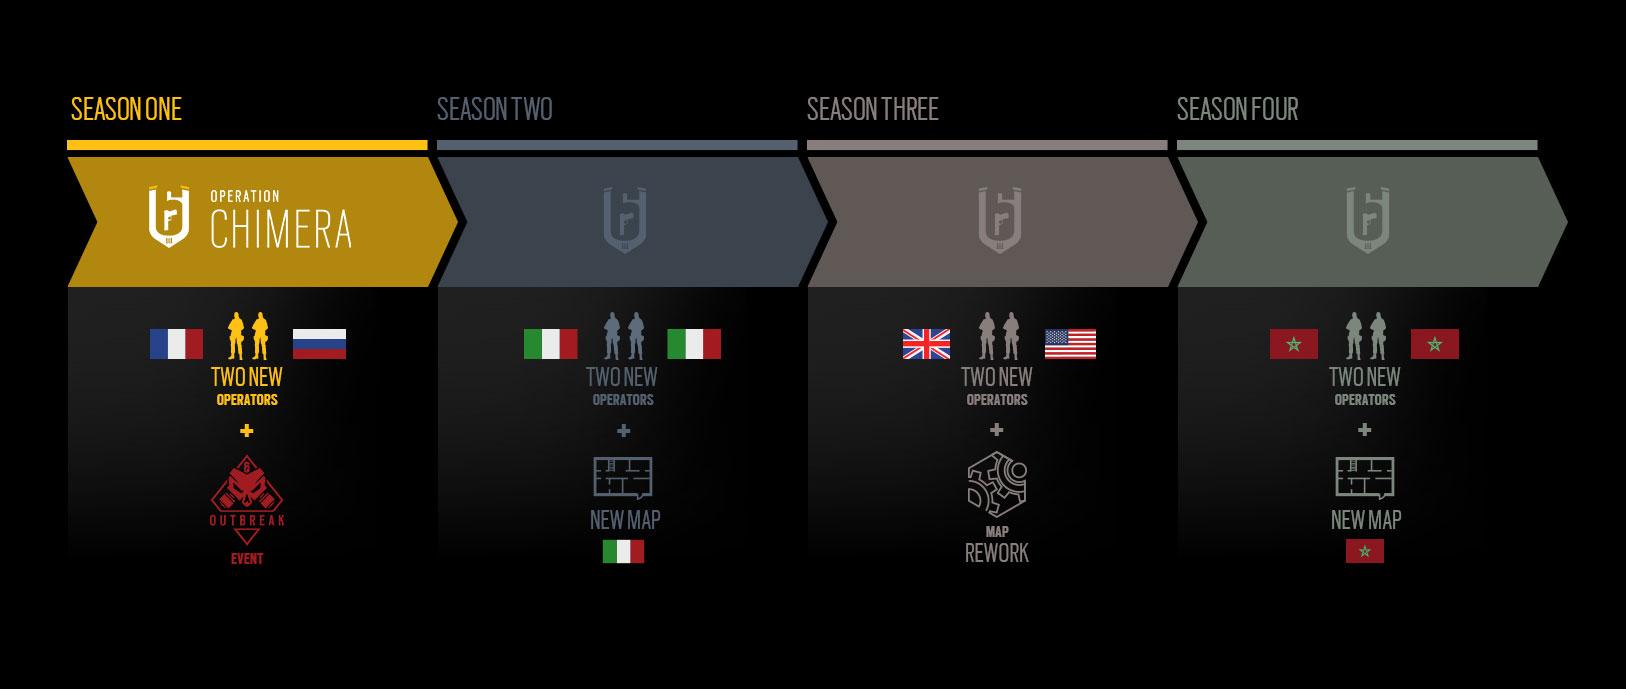 tercer año de contenidos de Tom Clancy's Rainbow Six Siege